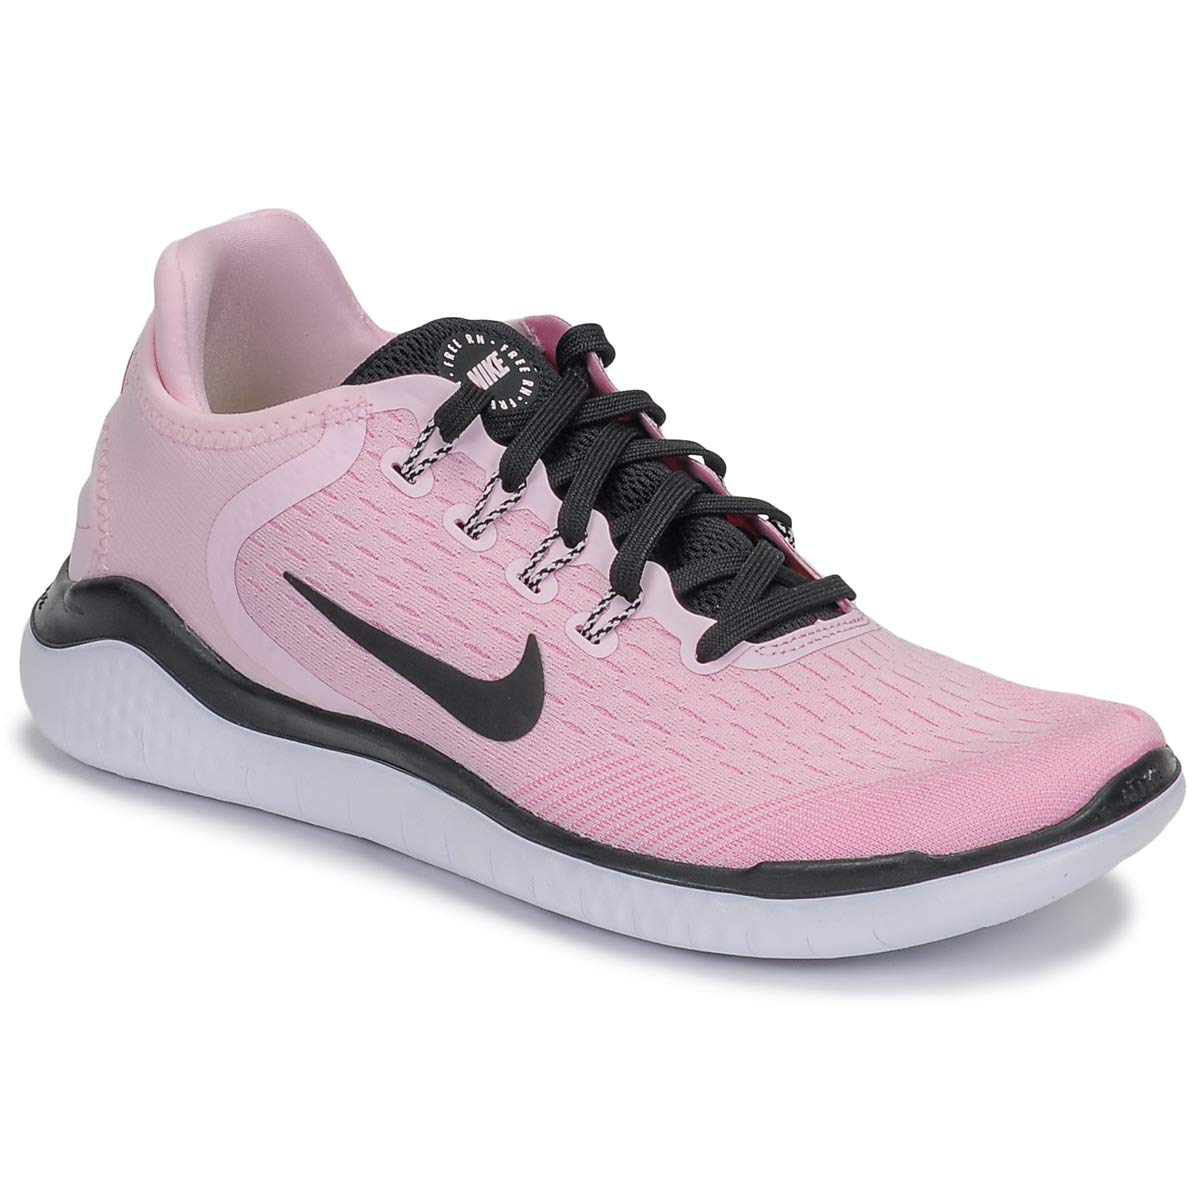 Nike Damen WMNS Free Rn 2018 Leichtathletikschuhe